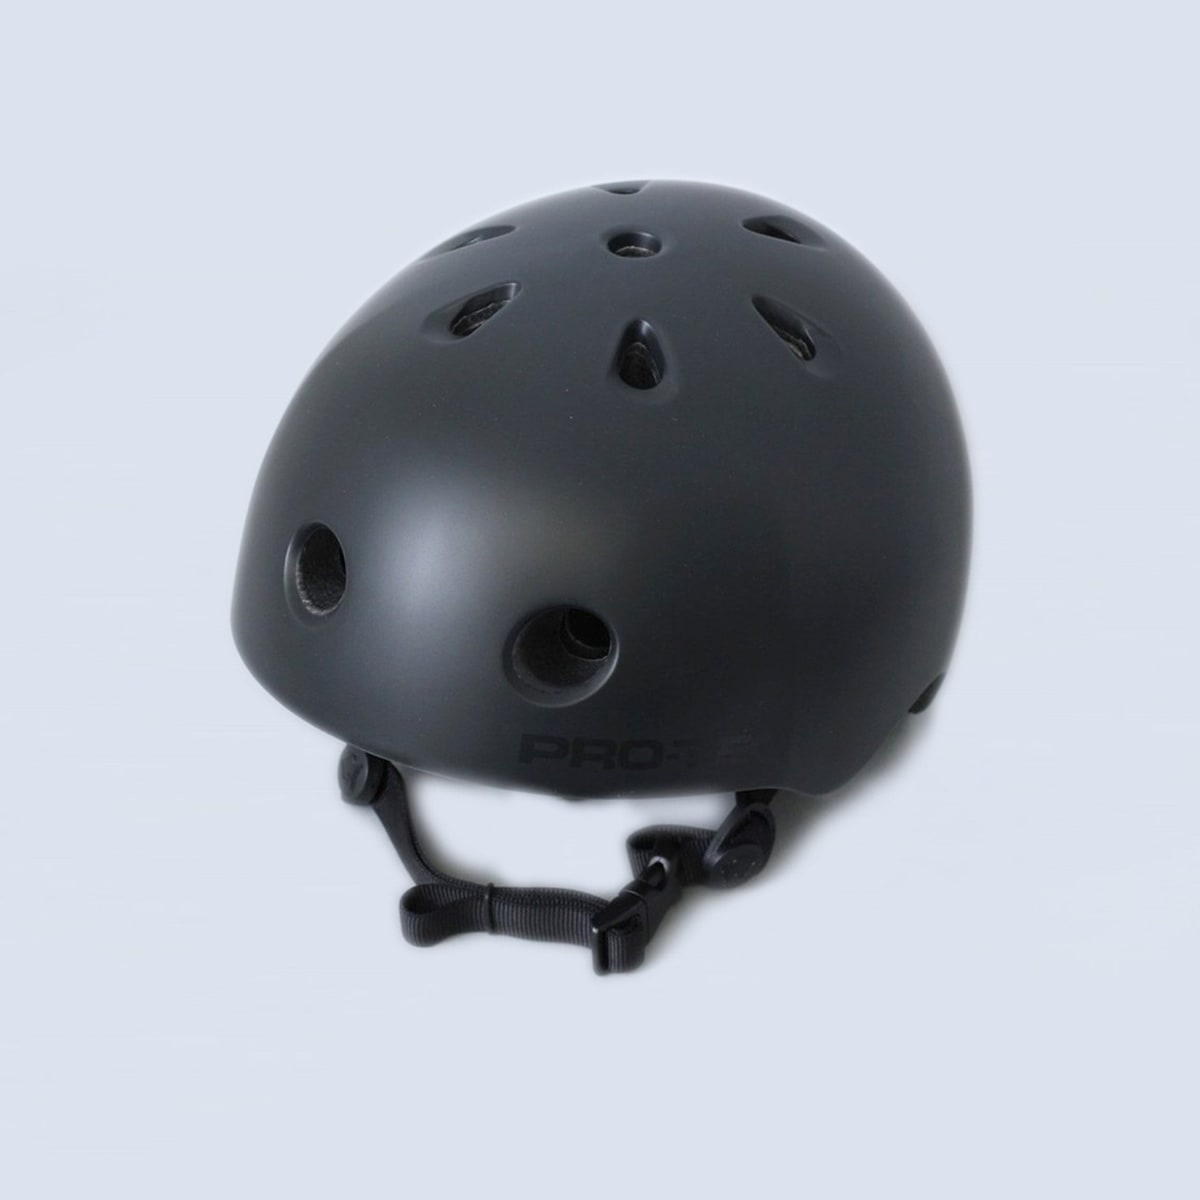 Pro Tec Street Lite Helmet are quality